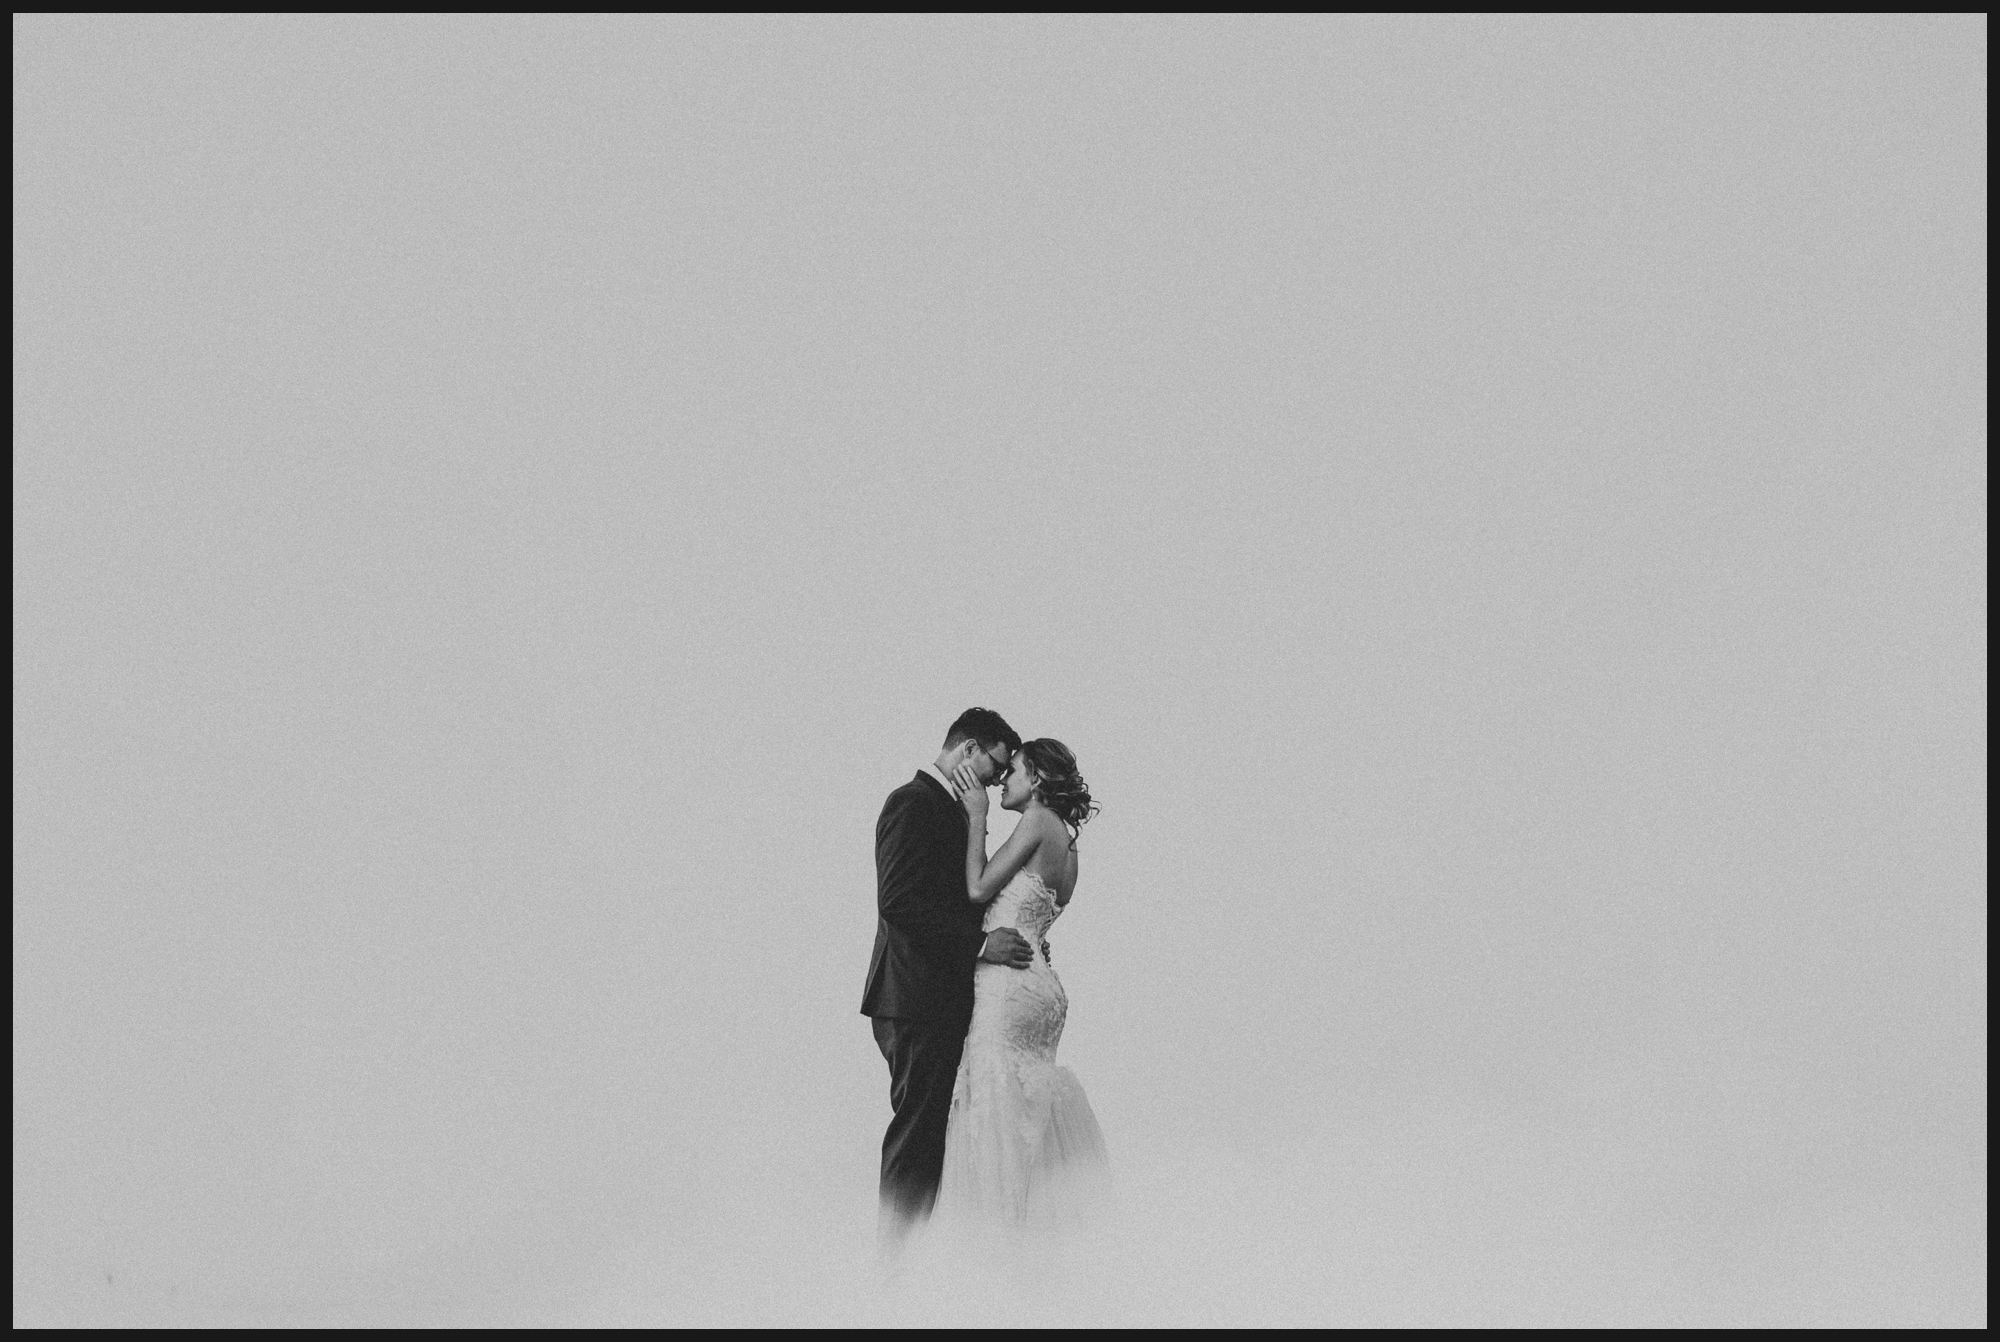 Orlando-Wedding-Photographer-destination-wedding-photographer-florida-wedding-photographer-bohemian-wedding-photographer_0117.jpg